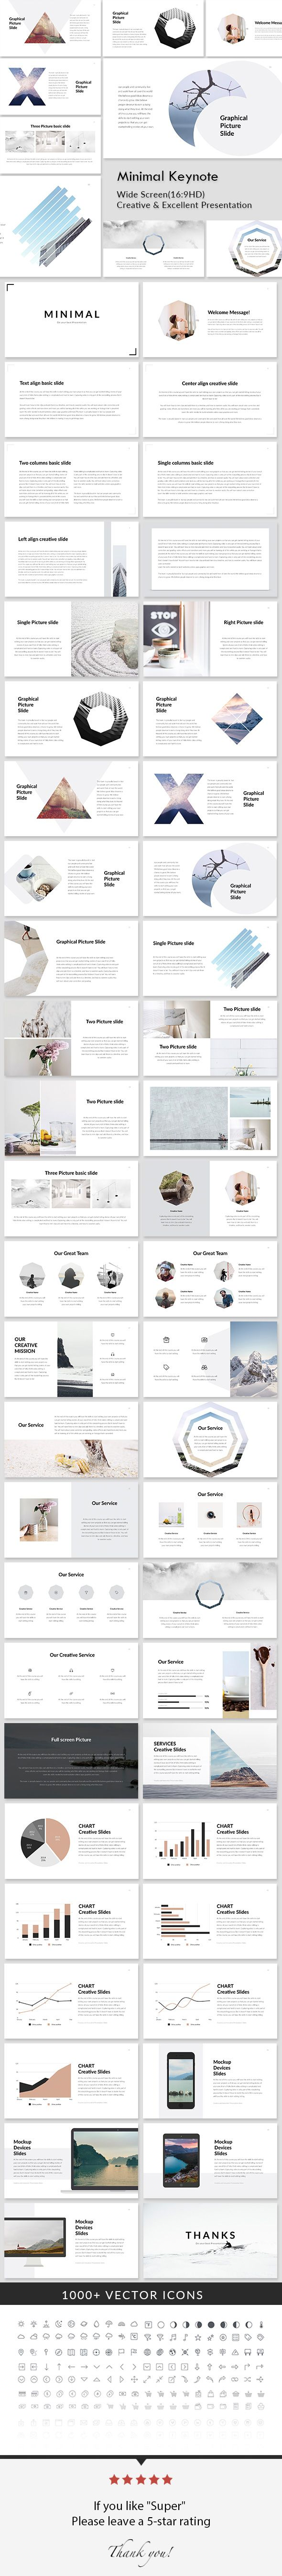 Minimal - Creative Keynote Presentation Template